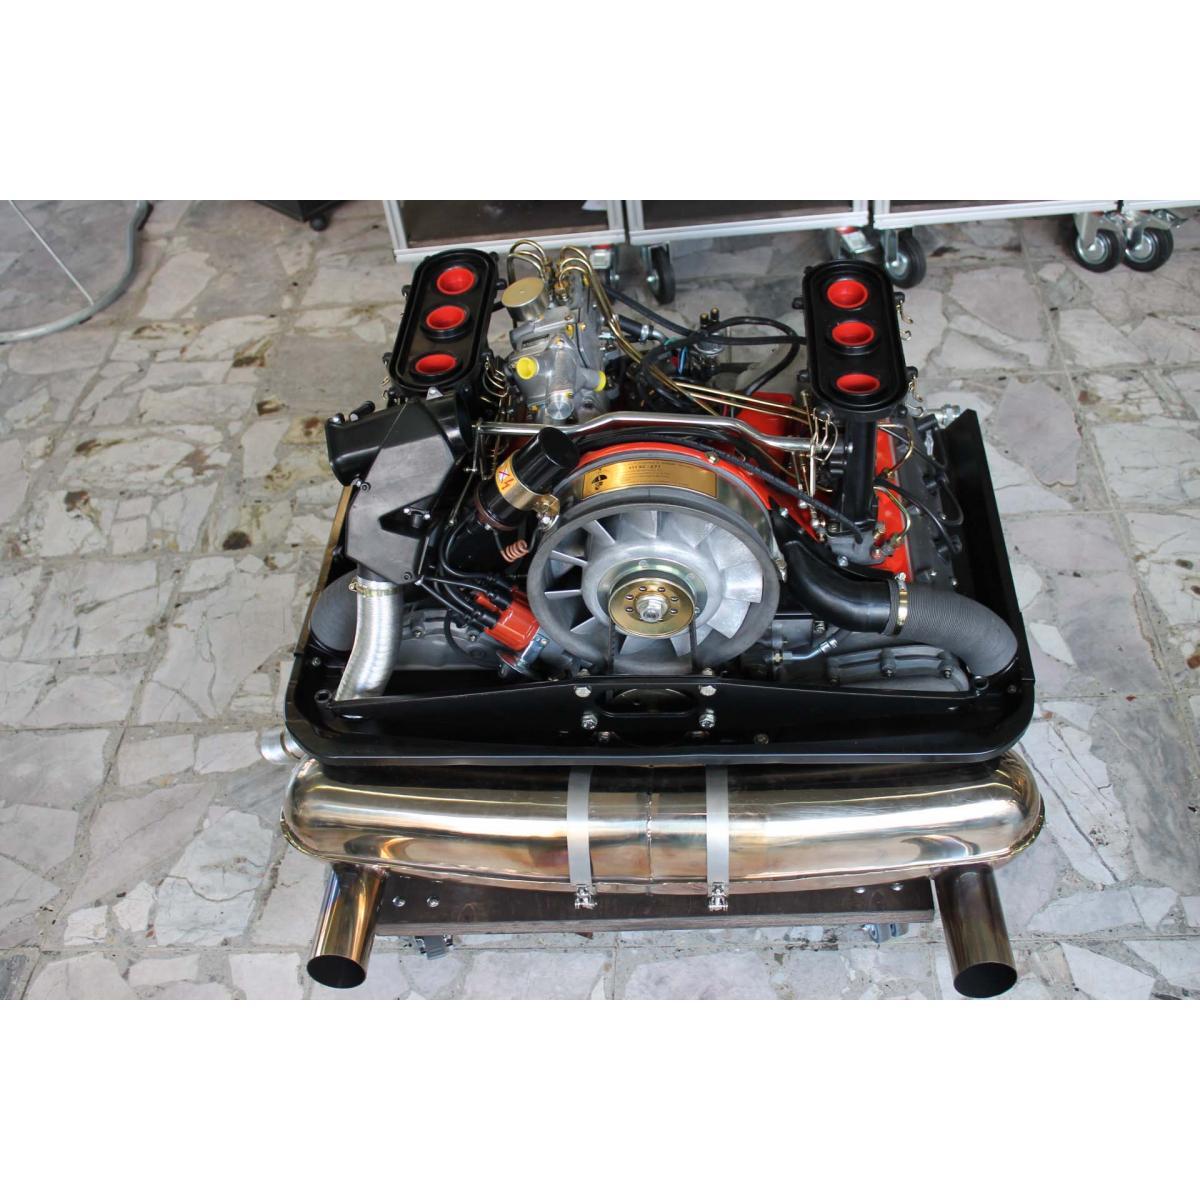 Motor komplett, 911 Carrera 2,7, 234 PS/ 276 Nm, Typ 911/83